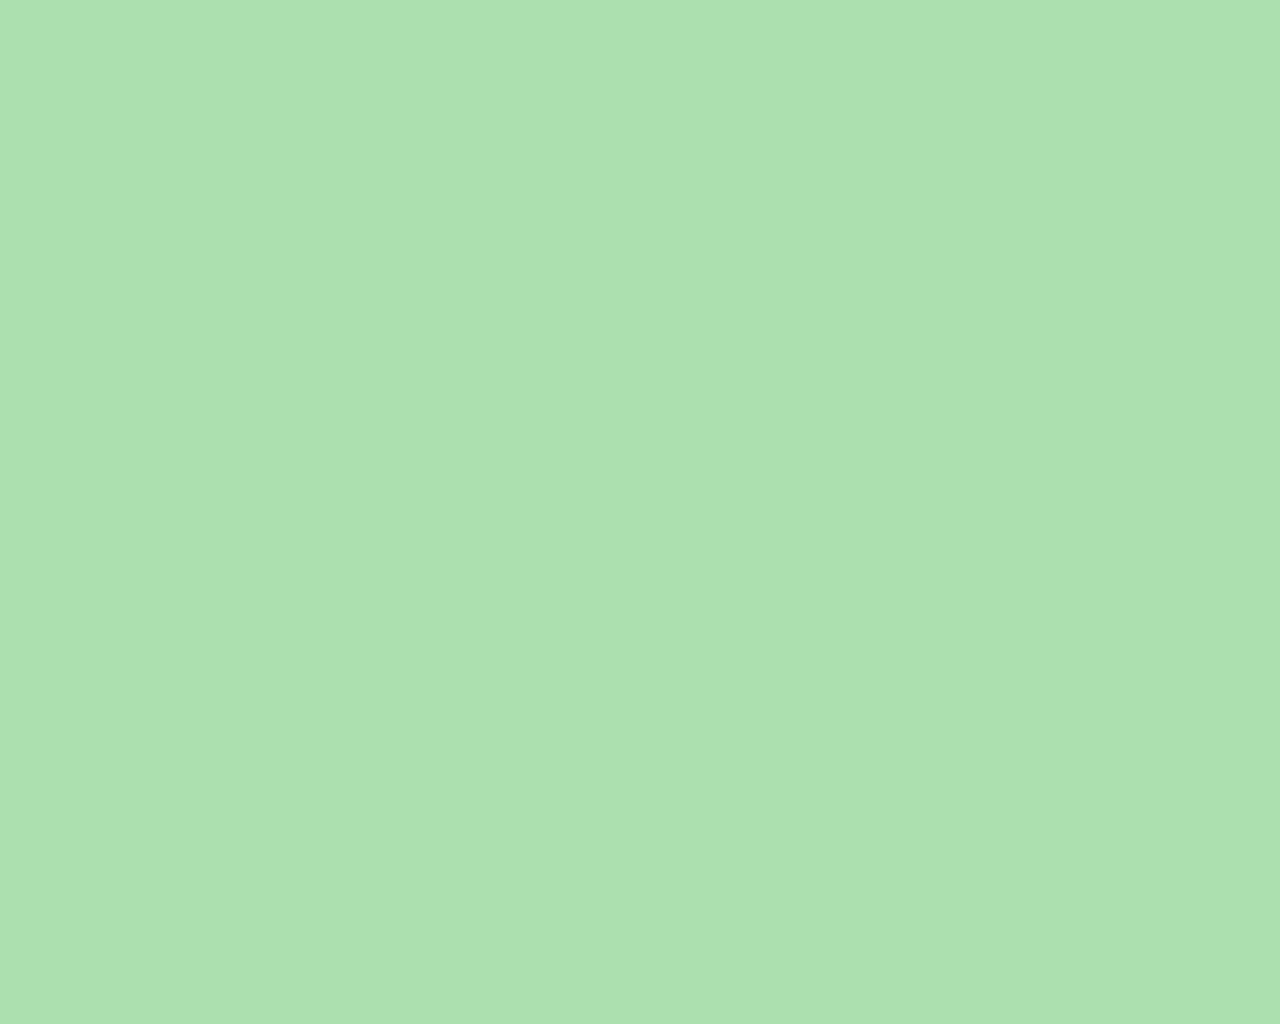 1280x1024 Celadon Solid Color Background